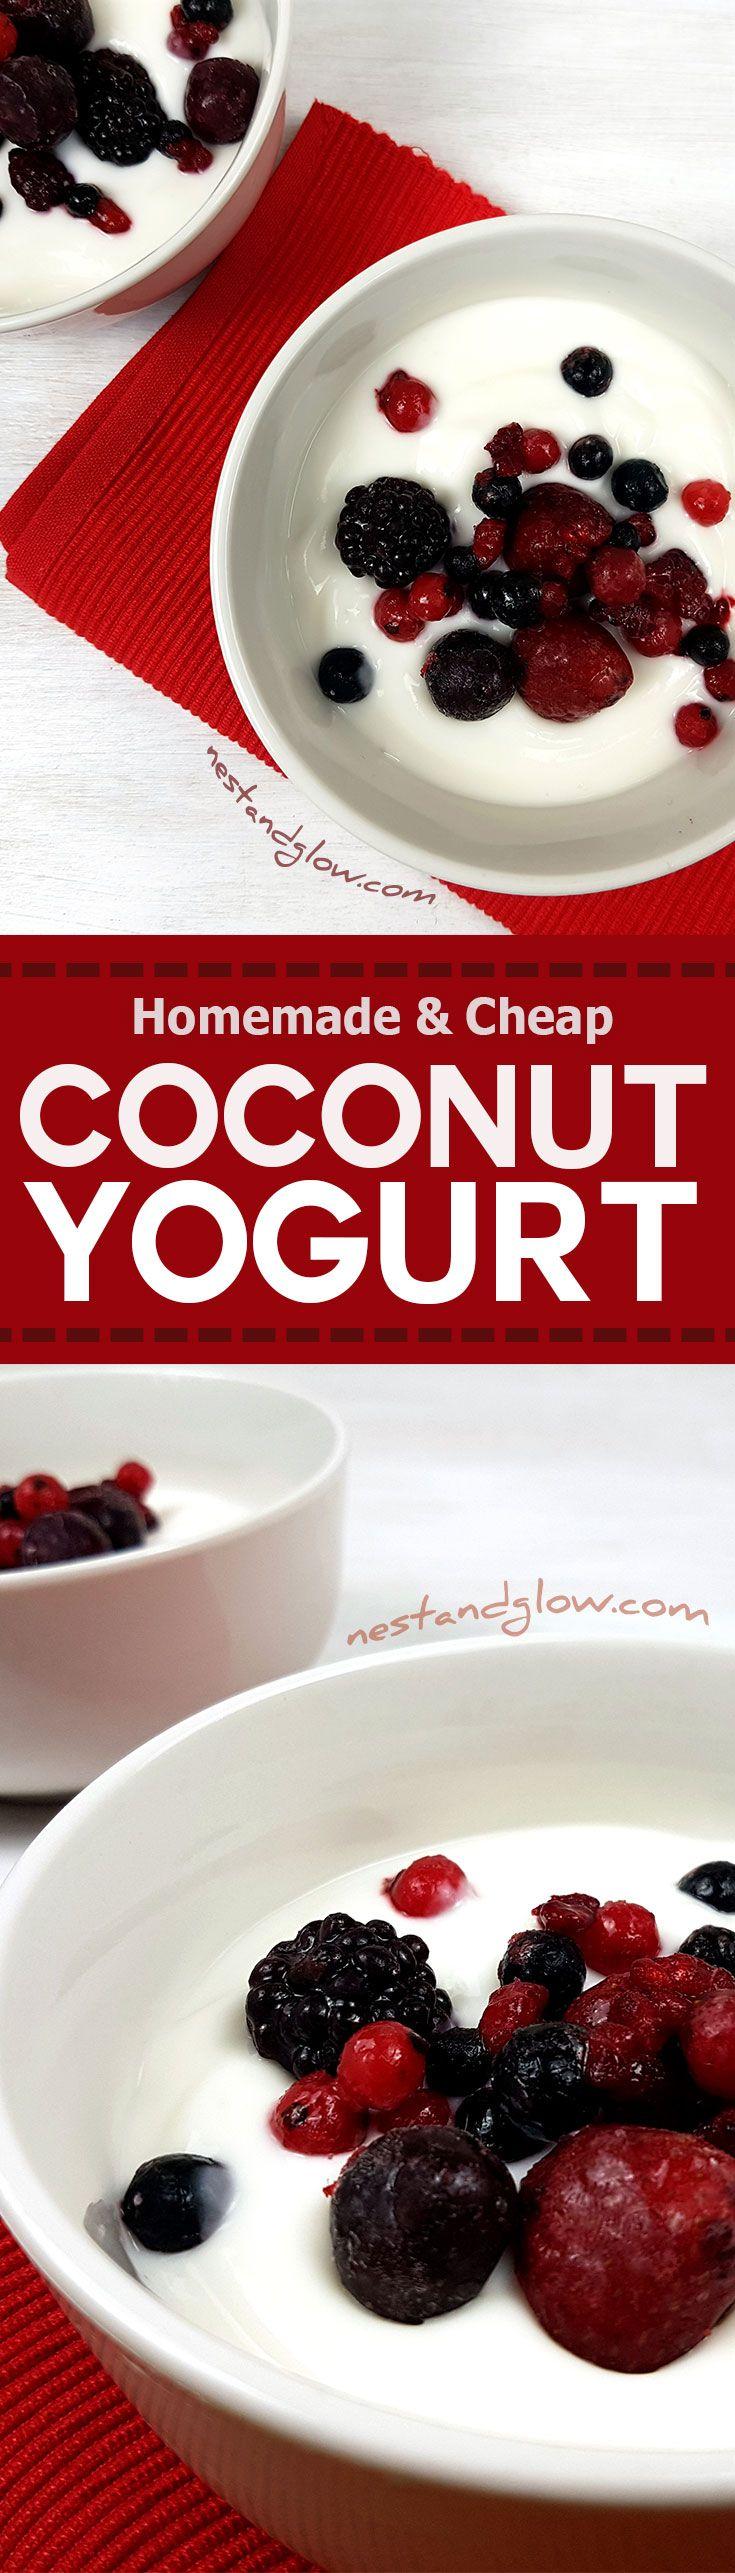 Dairy-free Easy Coconut Yoghurt Recipe - Vegan, Paleo and sugar free via @nestandglow